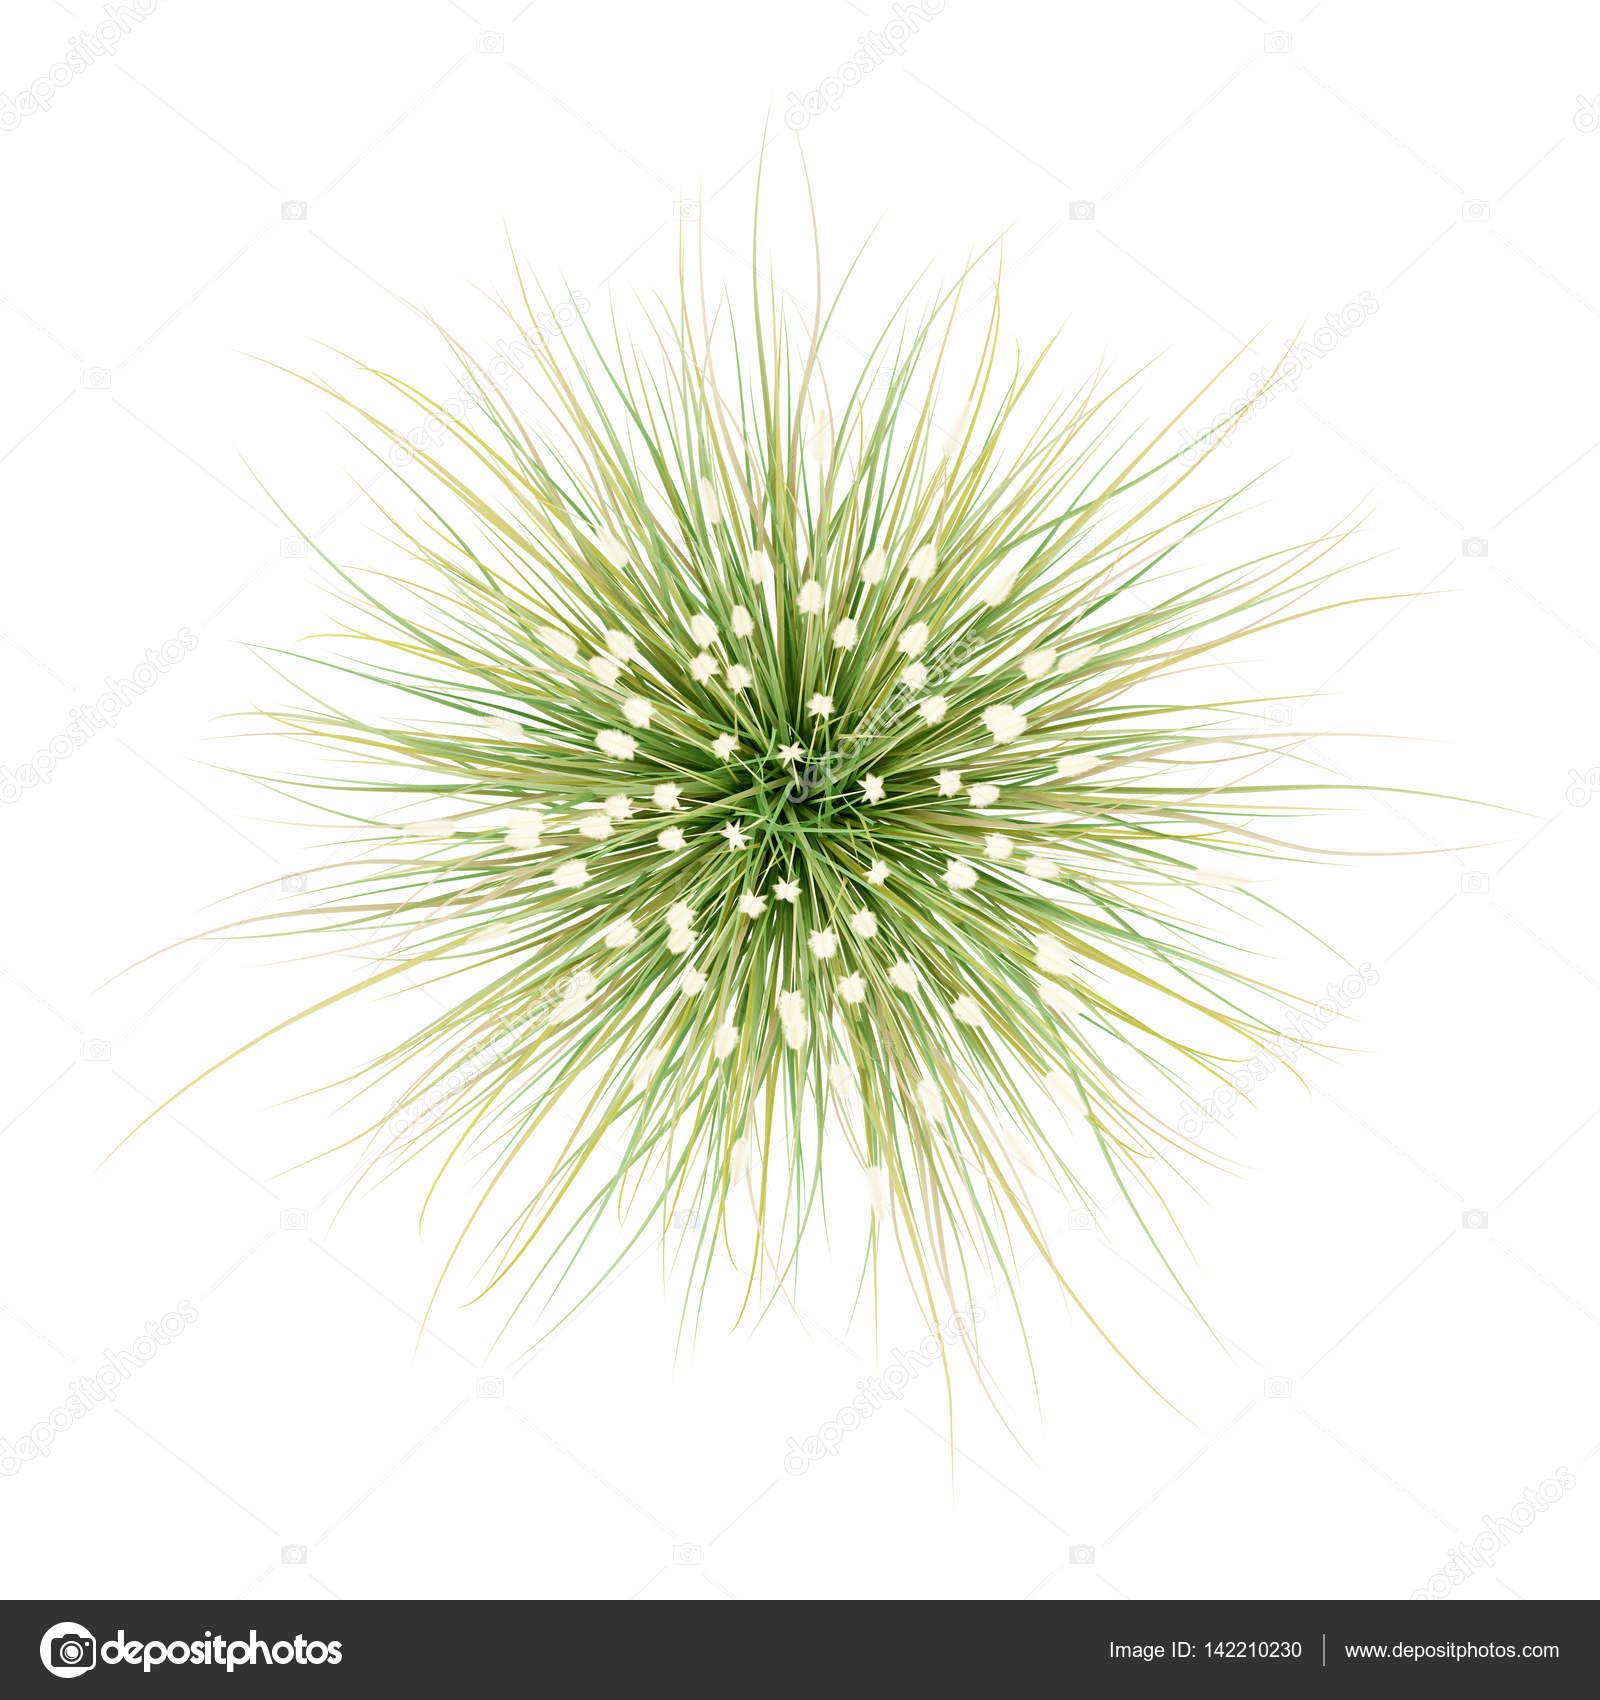 Vue de dessus de plante gramin e ornementale isol sur for Top ornamental grasses